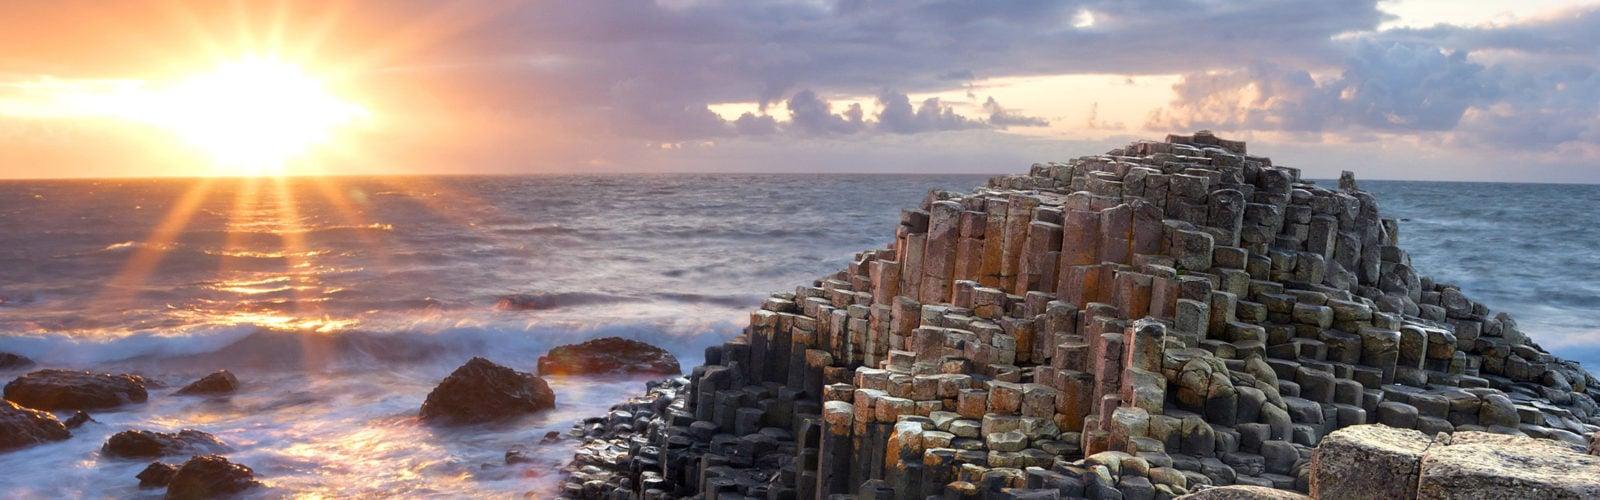 sunset-giants-causeway-ireland